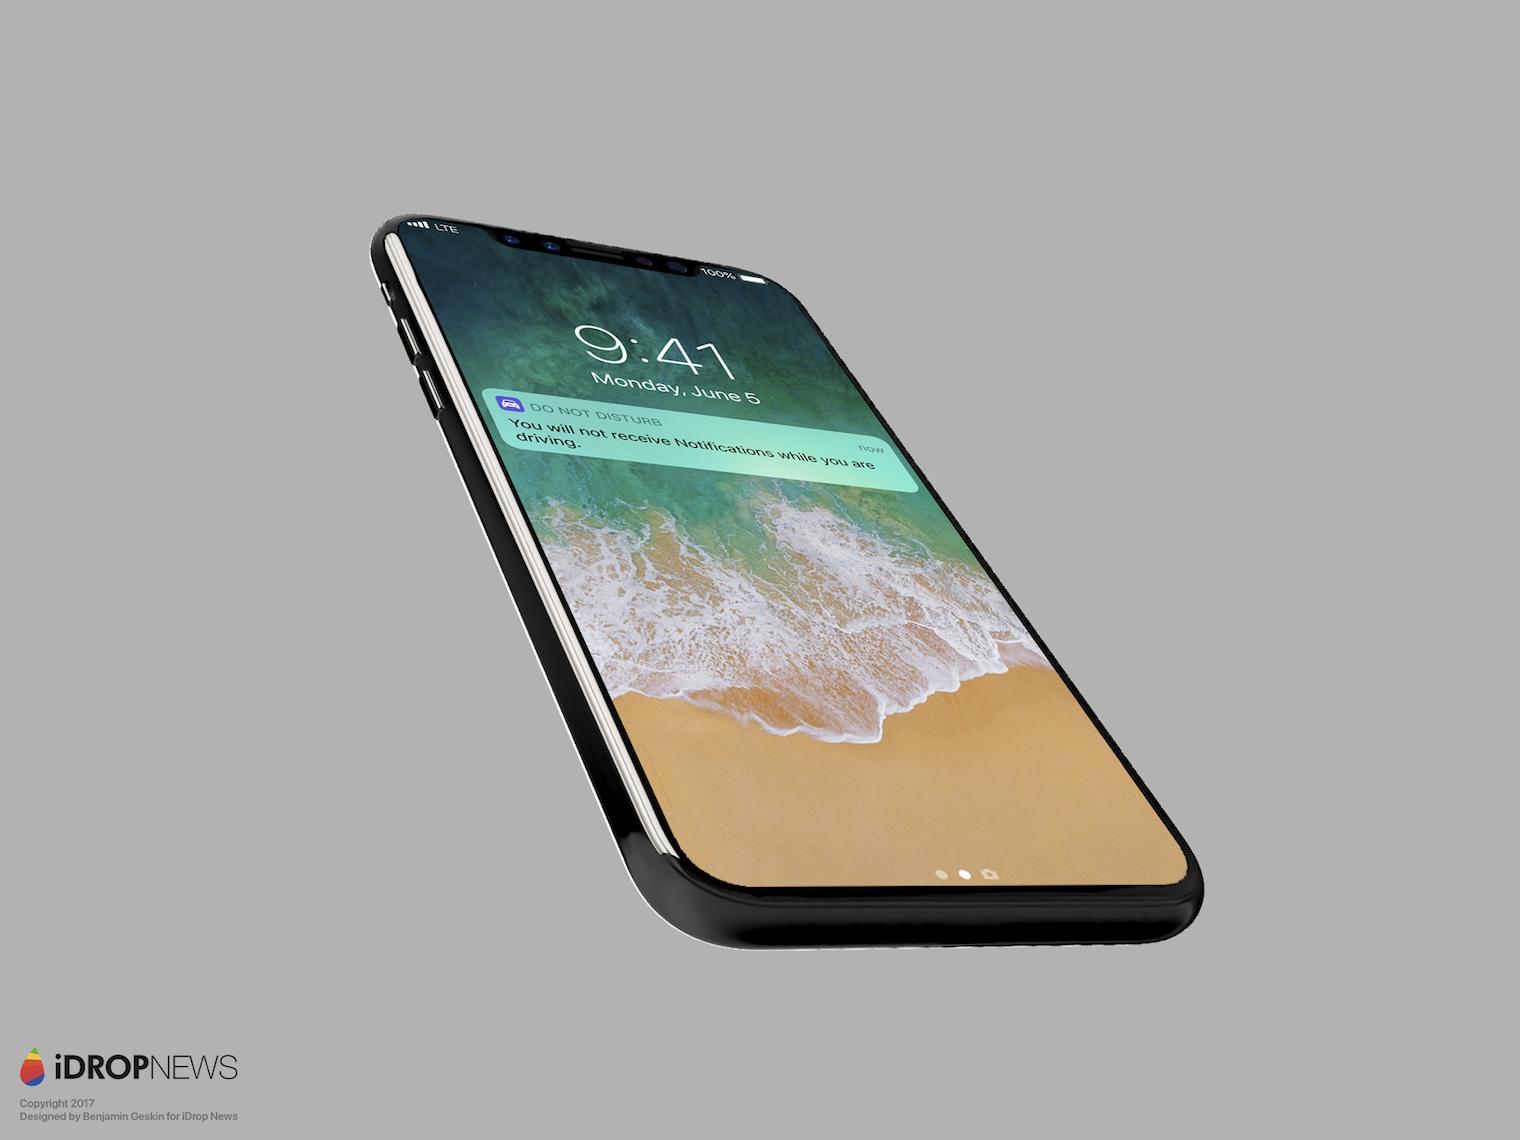 iPhone-X-iDrop-News-3